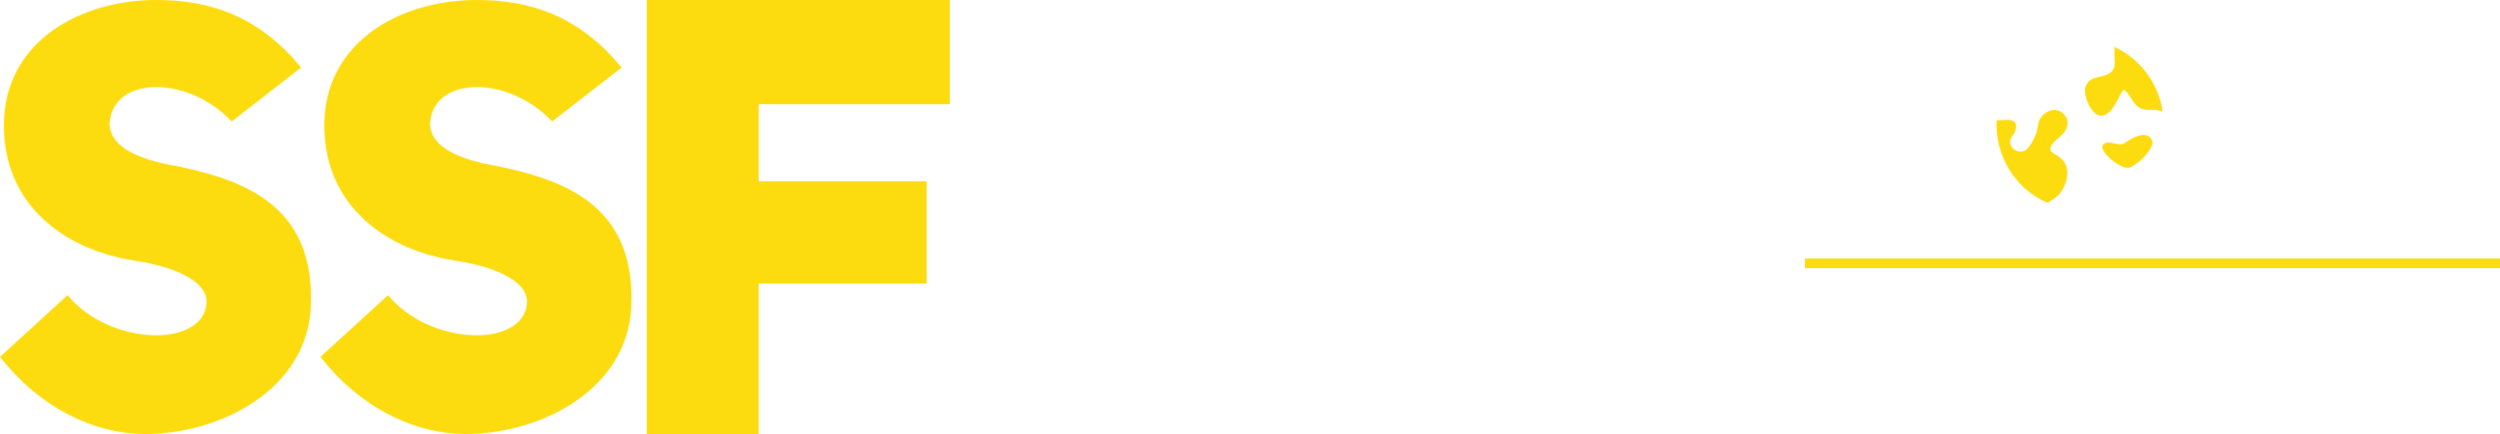 SSFIHE2019-Logo.png